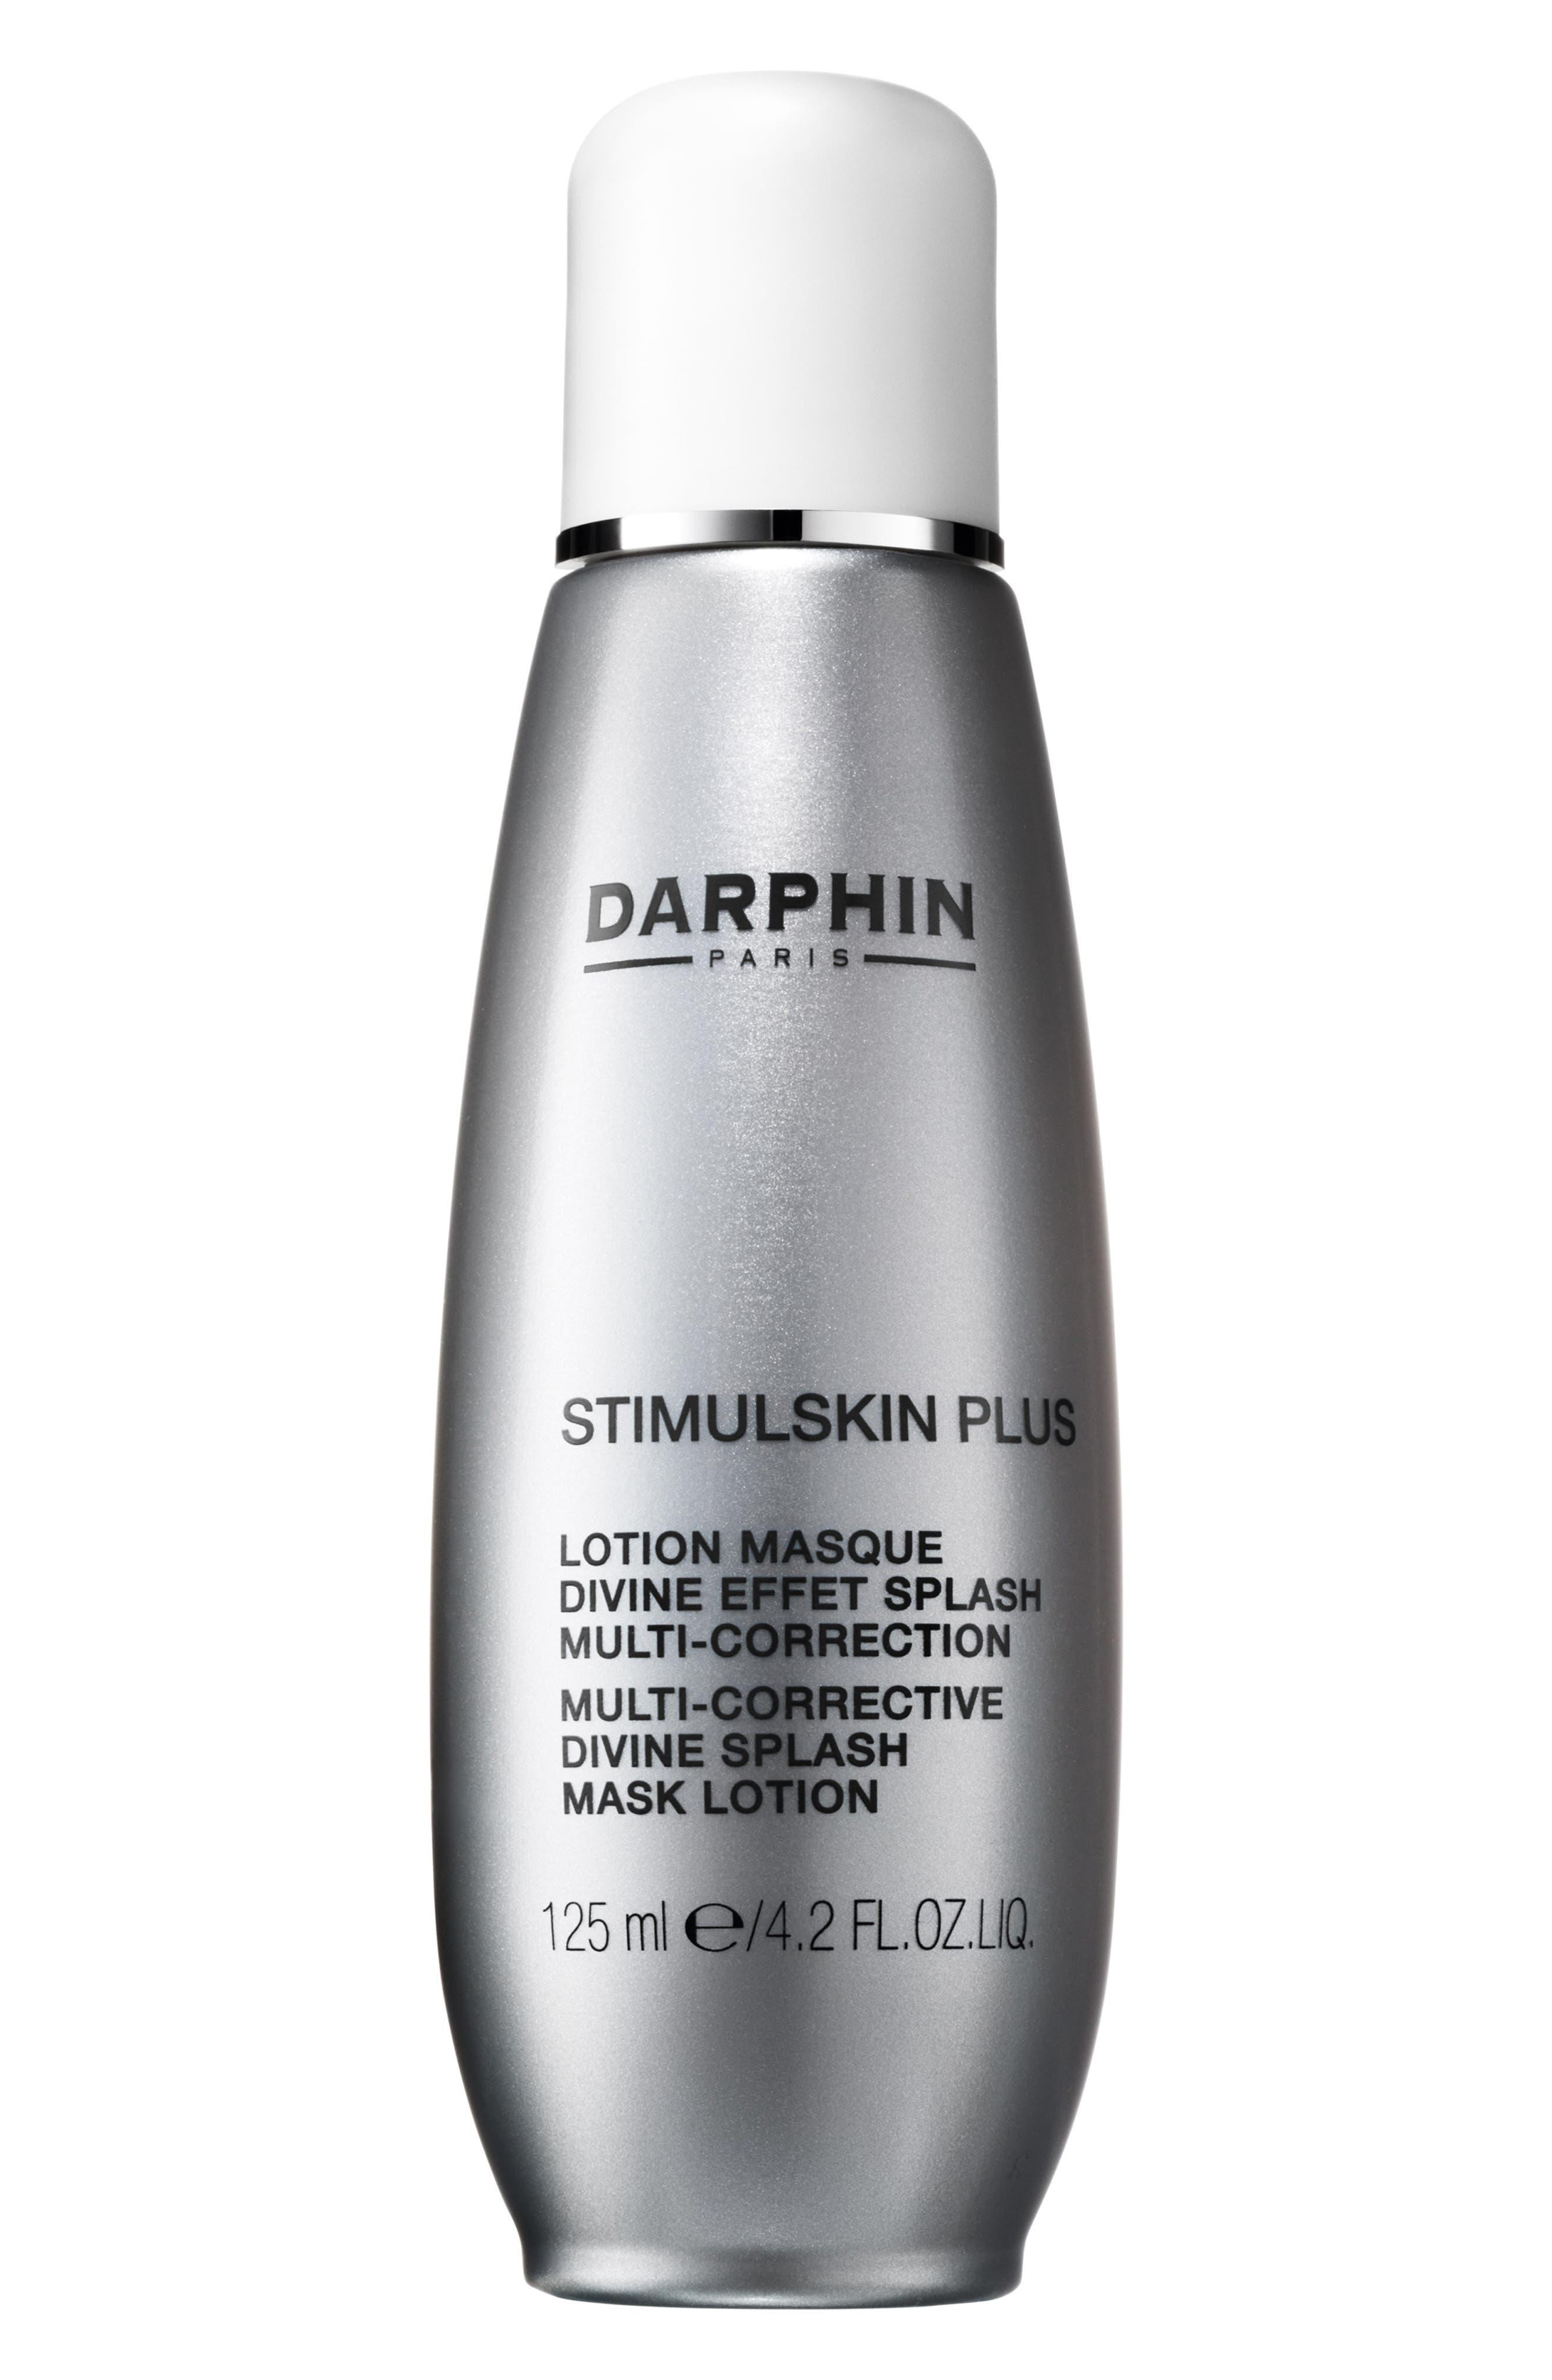 Stimulskin Plus Multi-Corrective Divine Splash Mask Lotion